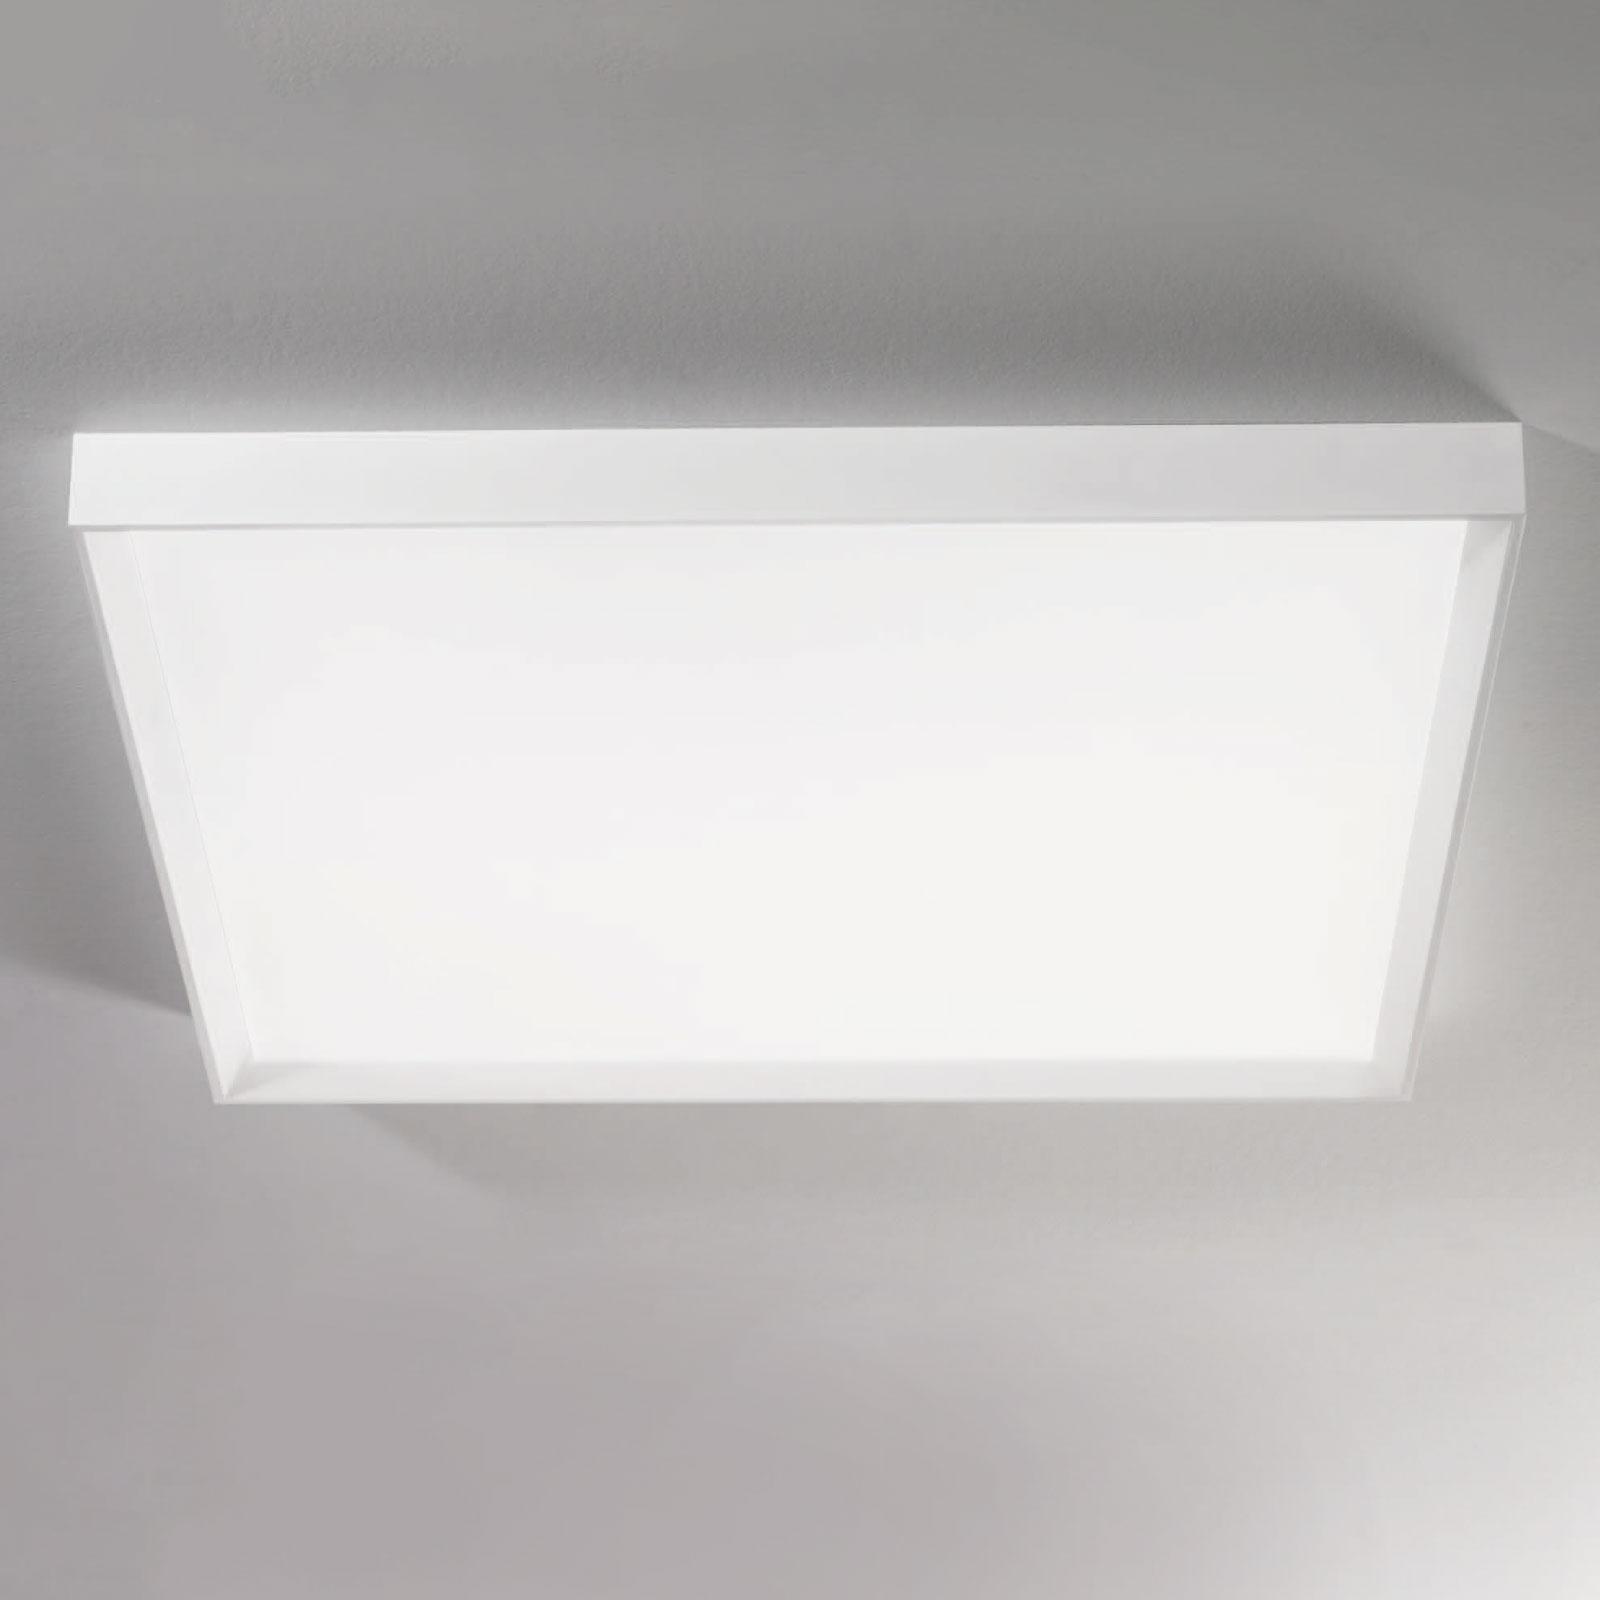 Lampa sufitowa LED Tara mega, 89 cm x 89 cm